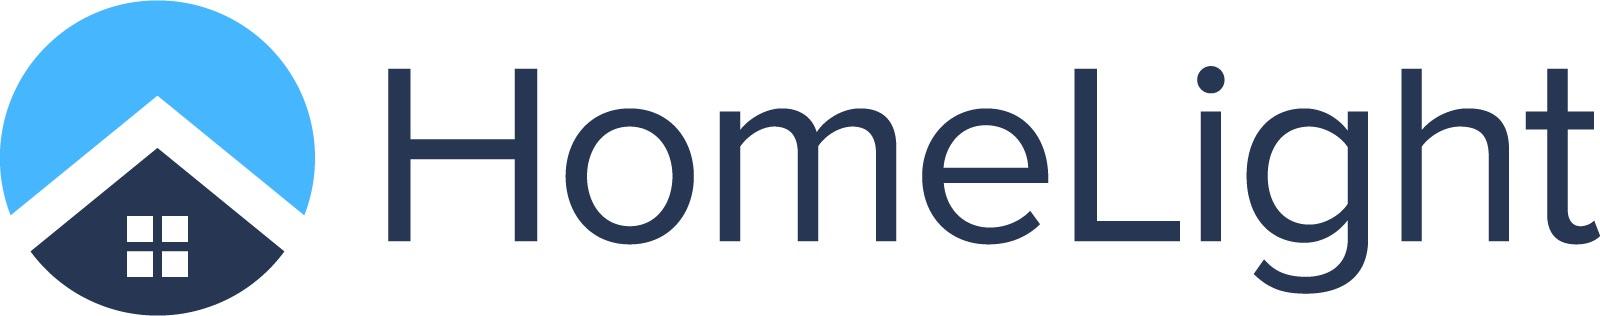 Homelight - Community Collaborator